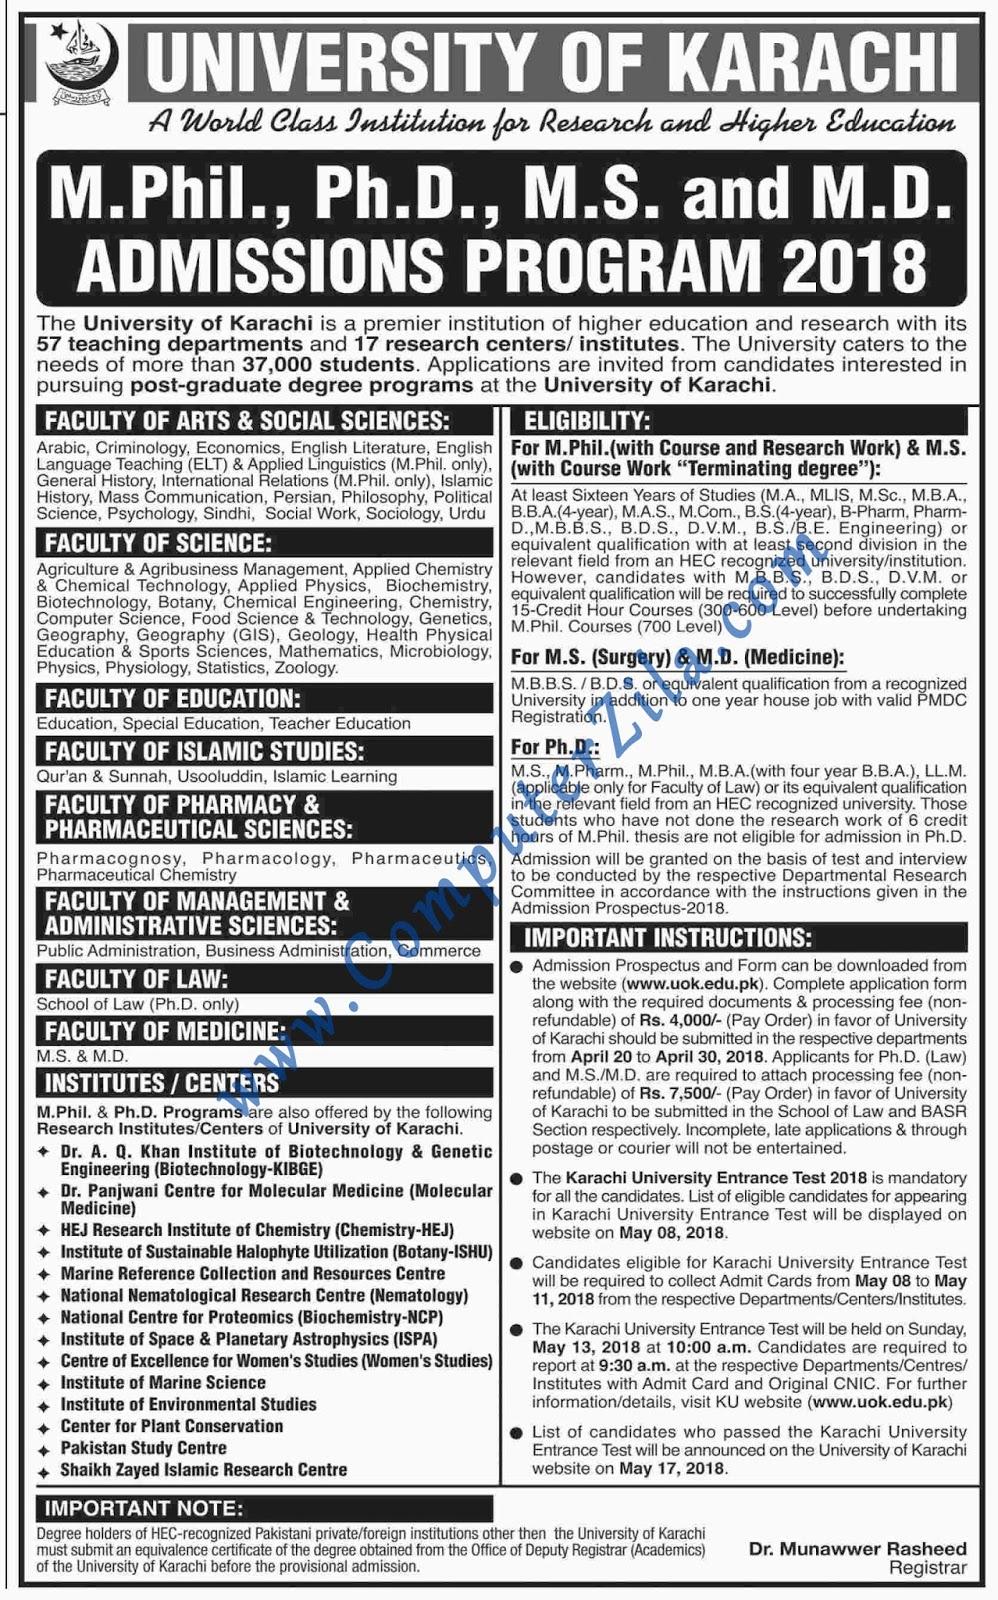 University of Karachi Admissions Spring 2018